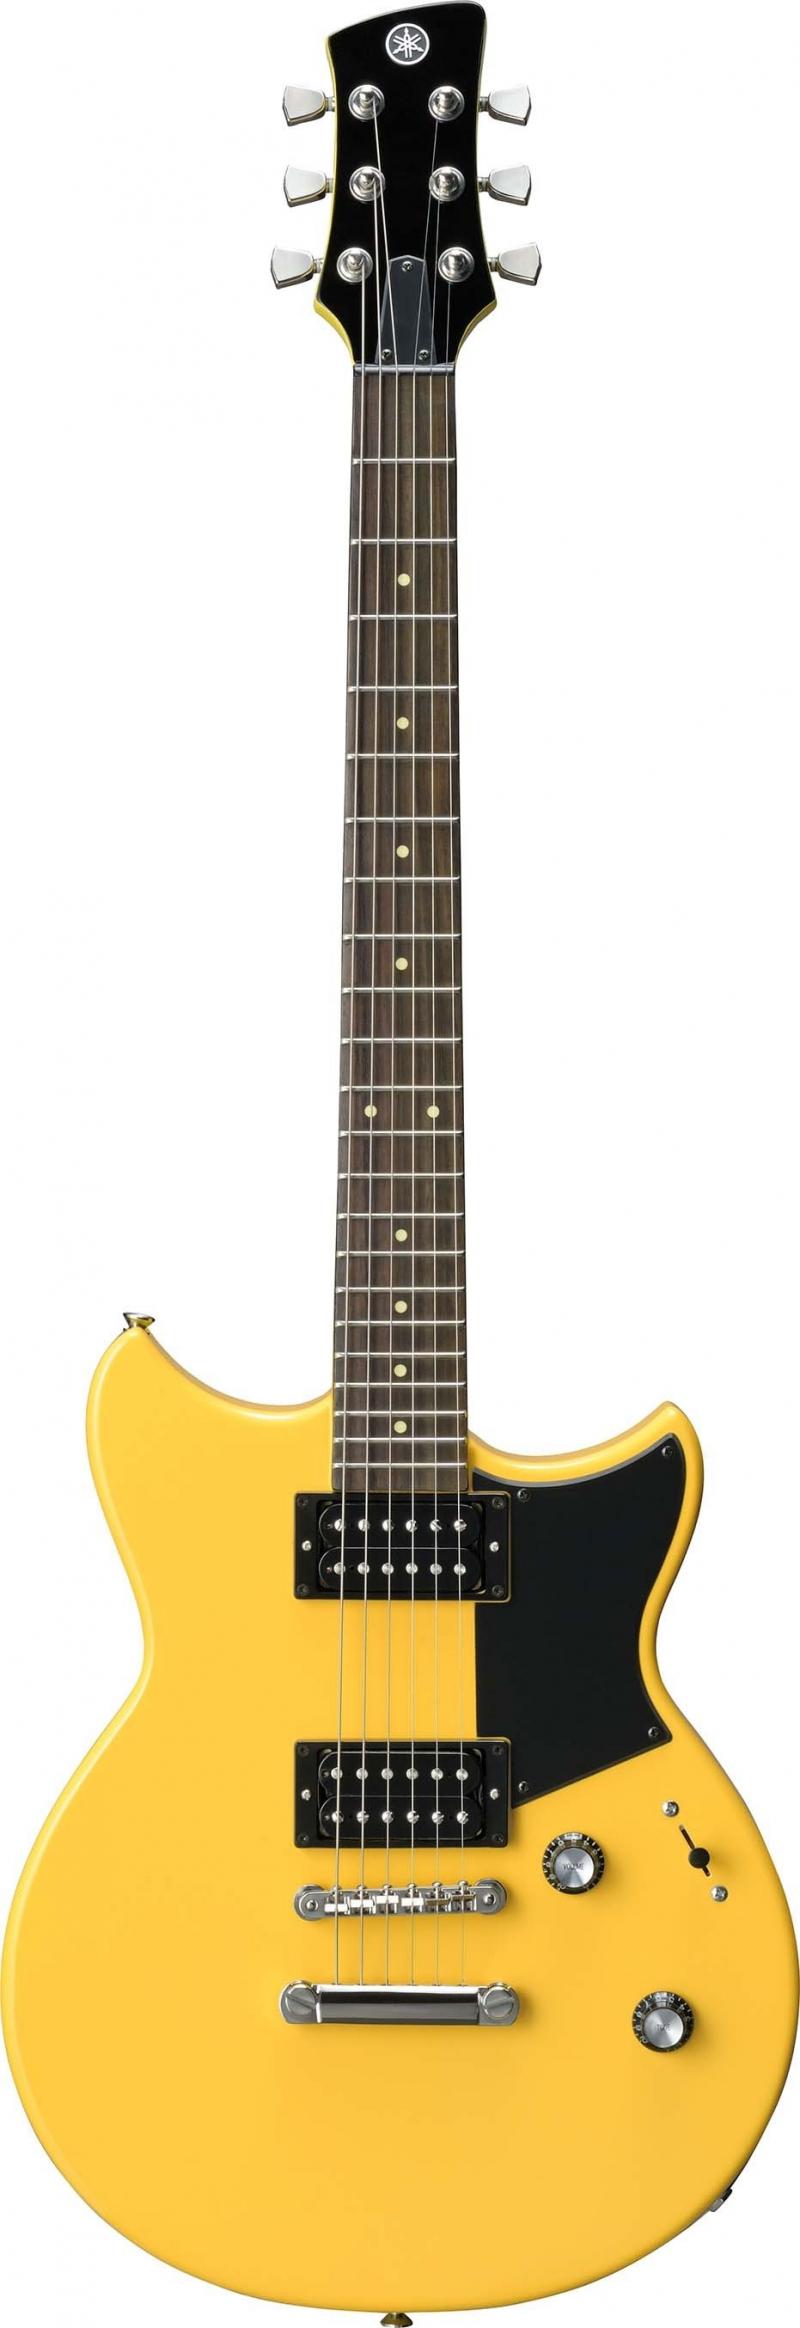 Yamaha Revstar RS320SYL elektriskā ģitāra